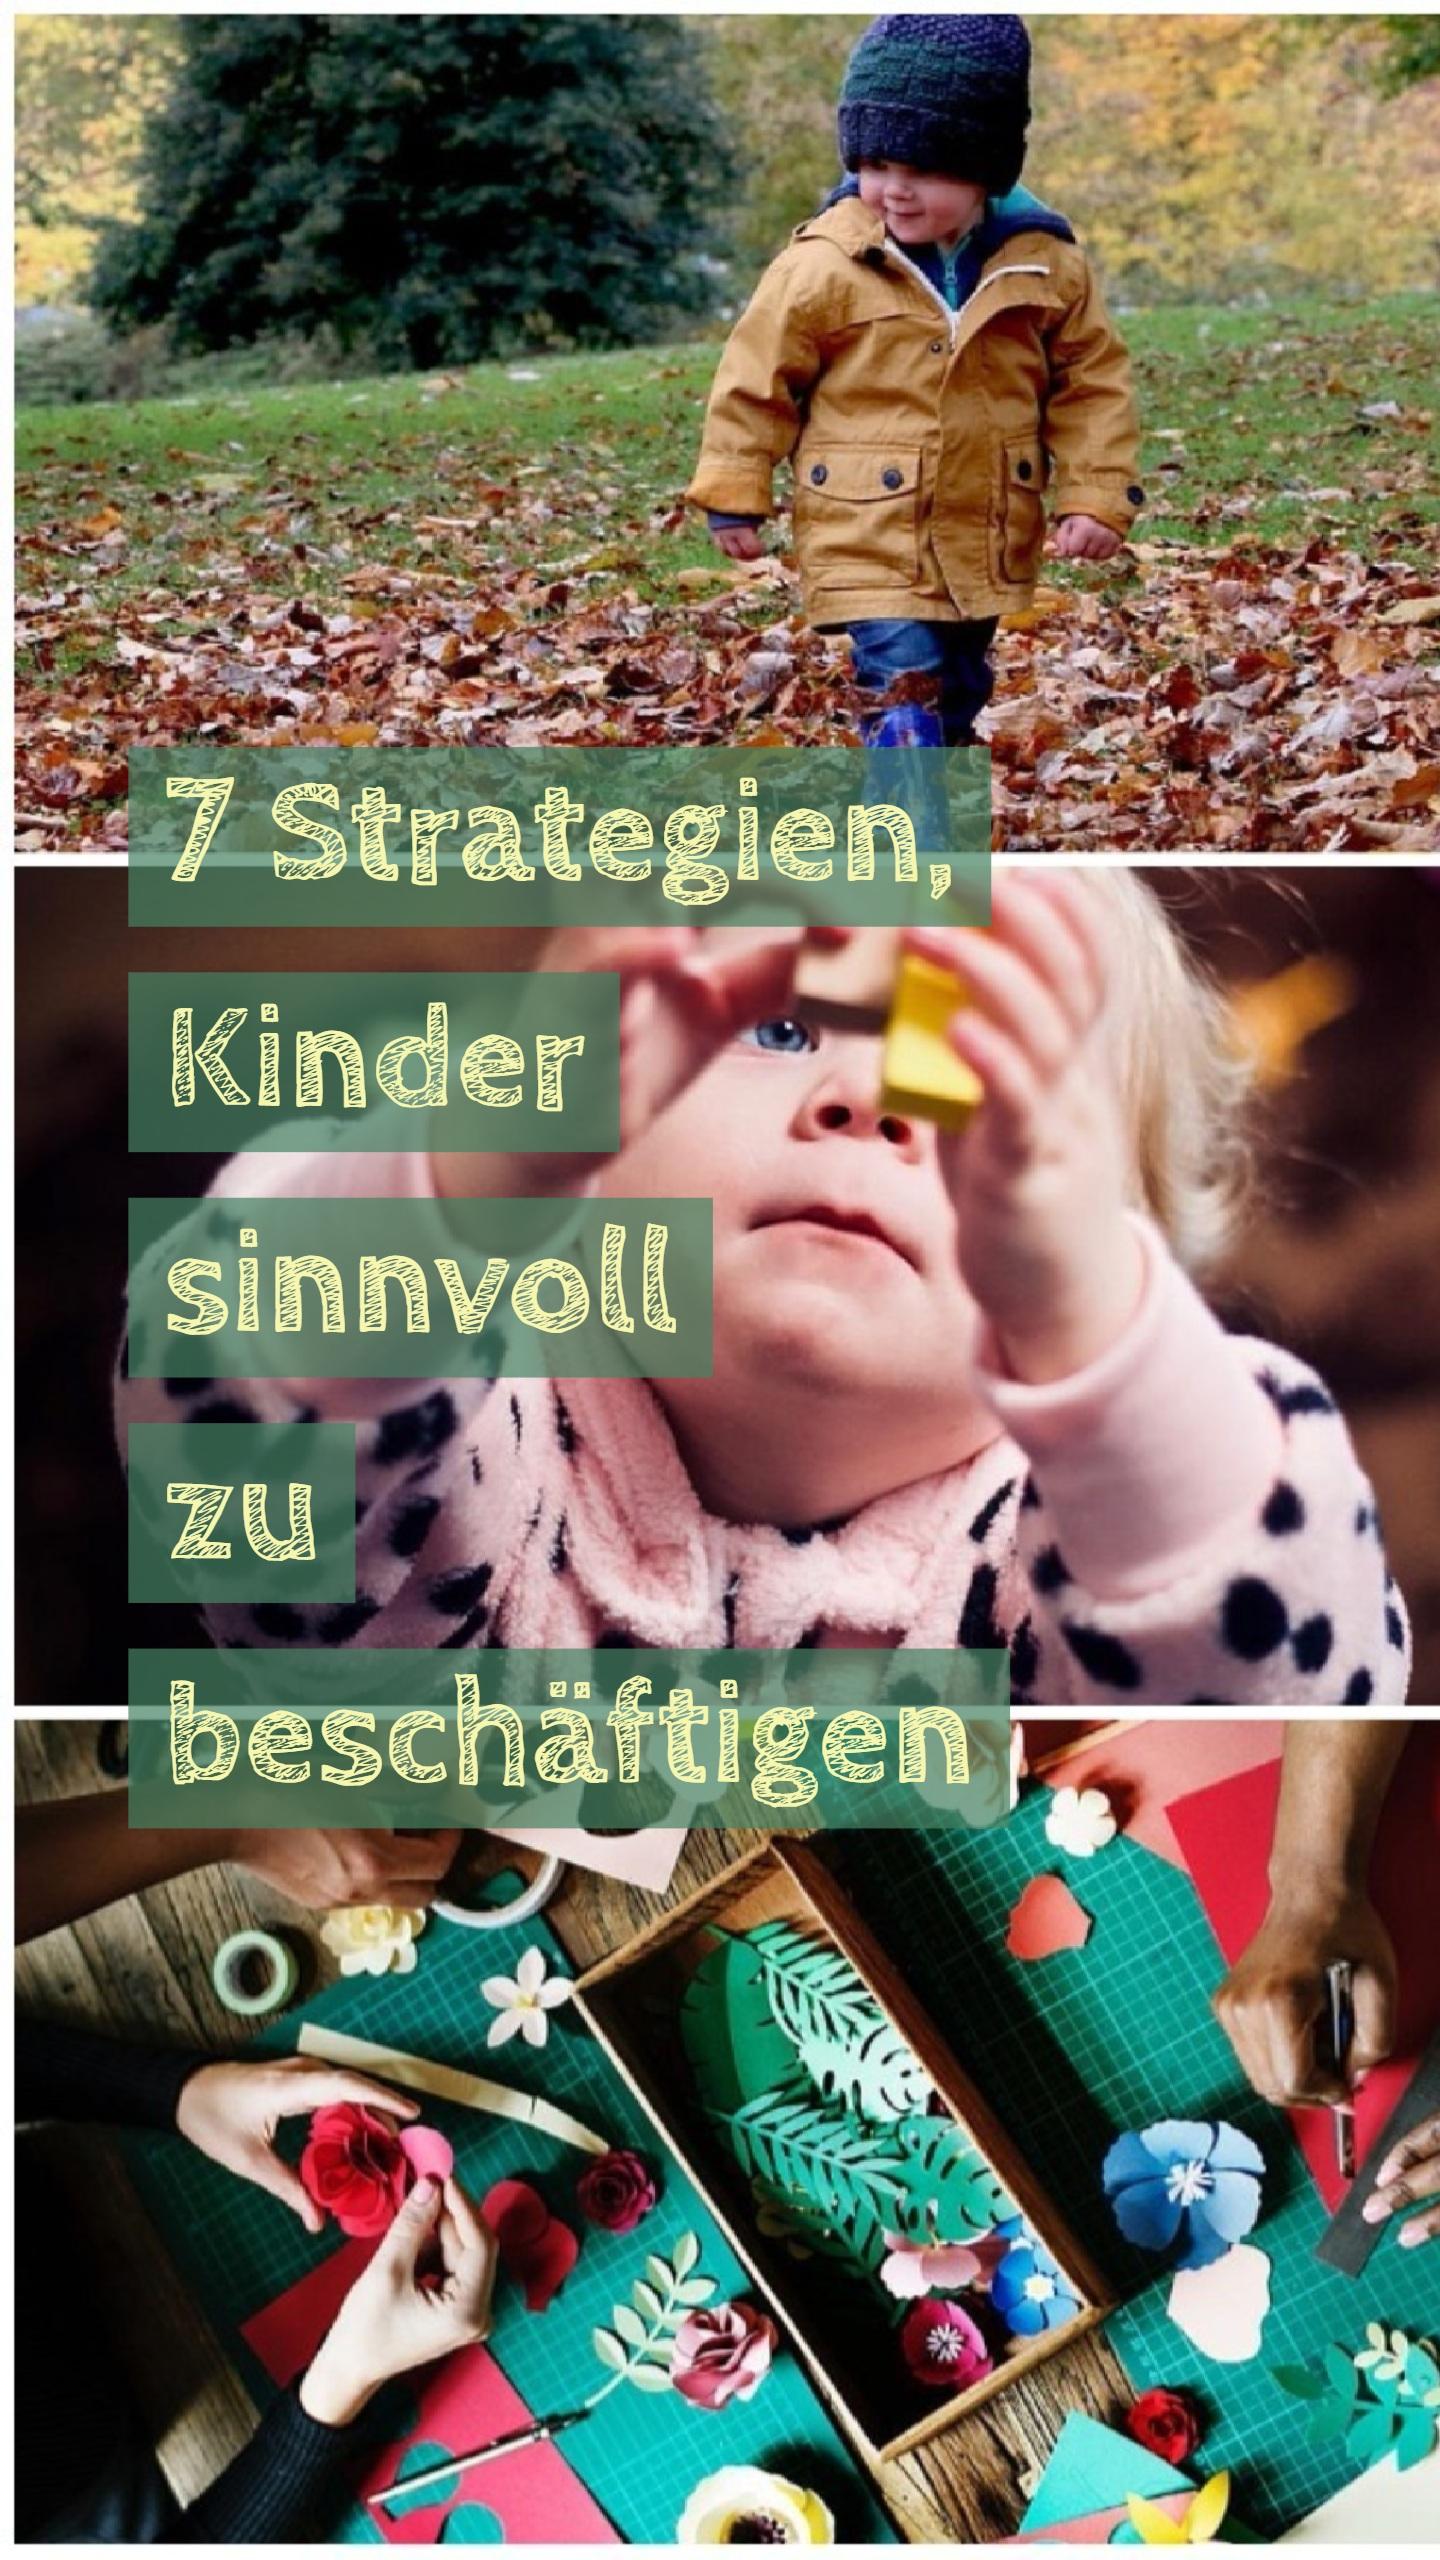 Weg Mit Dem Smartphone 7 Strategien Kinder Sinnvoll Zu Beschaftigen